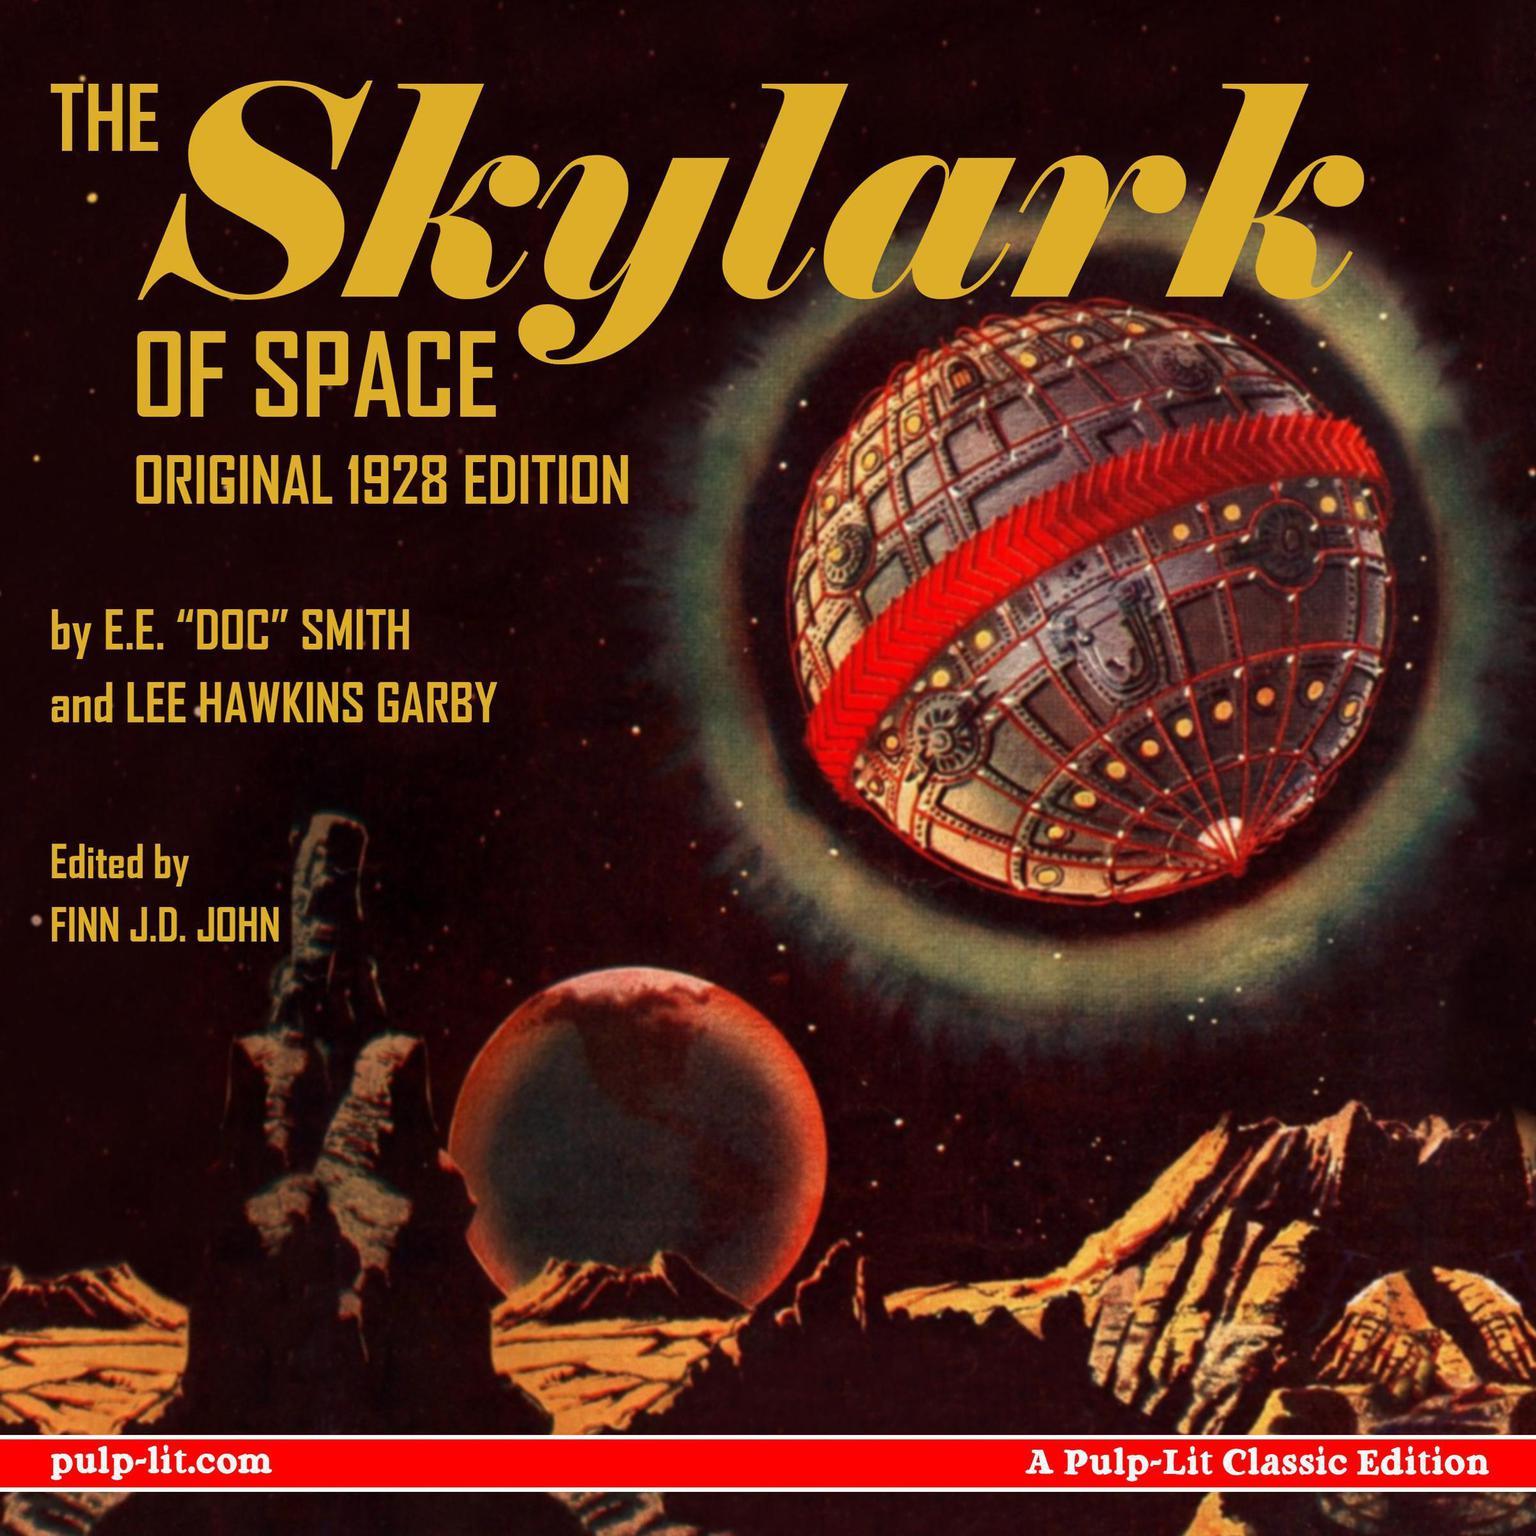 The Skylark of Space: The Original 1928 Edition Audiobook, by E.E. 'Doc' Smith